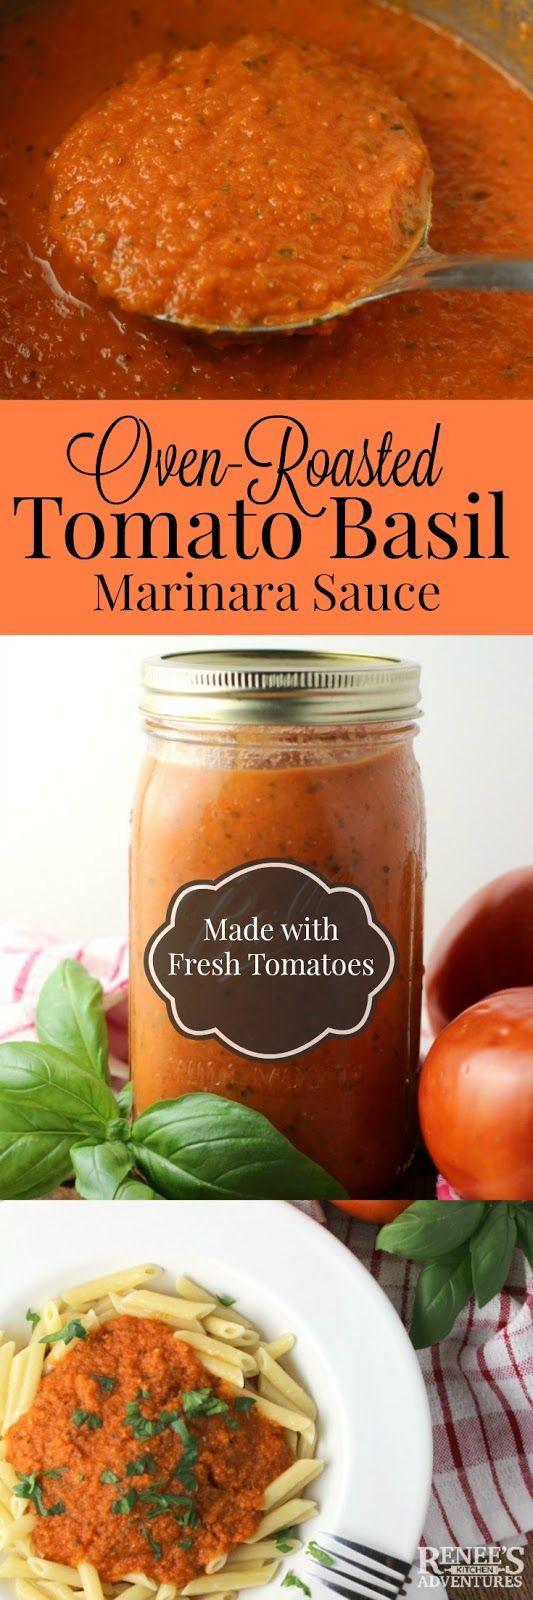 Oven-Roasted Tomato Basil Marinara Sauce   Renee's Kitchen Adventures #SundaySupper easy recipe for fresh tomatoes